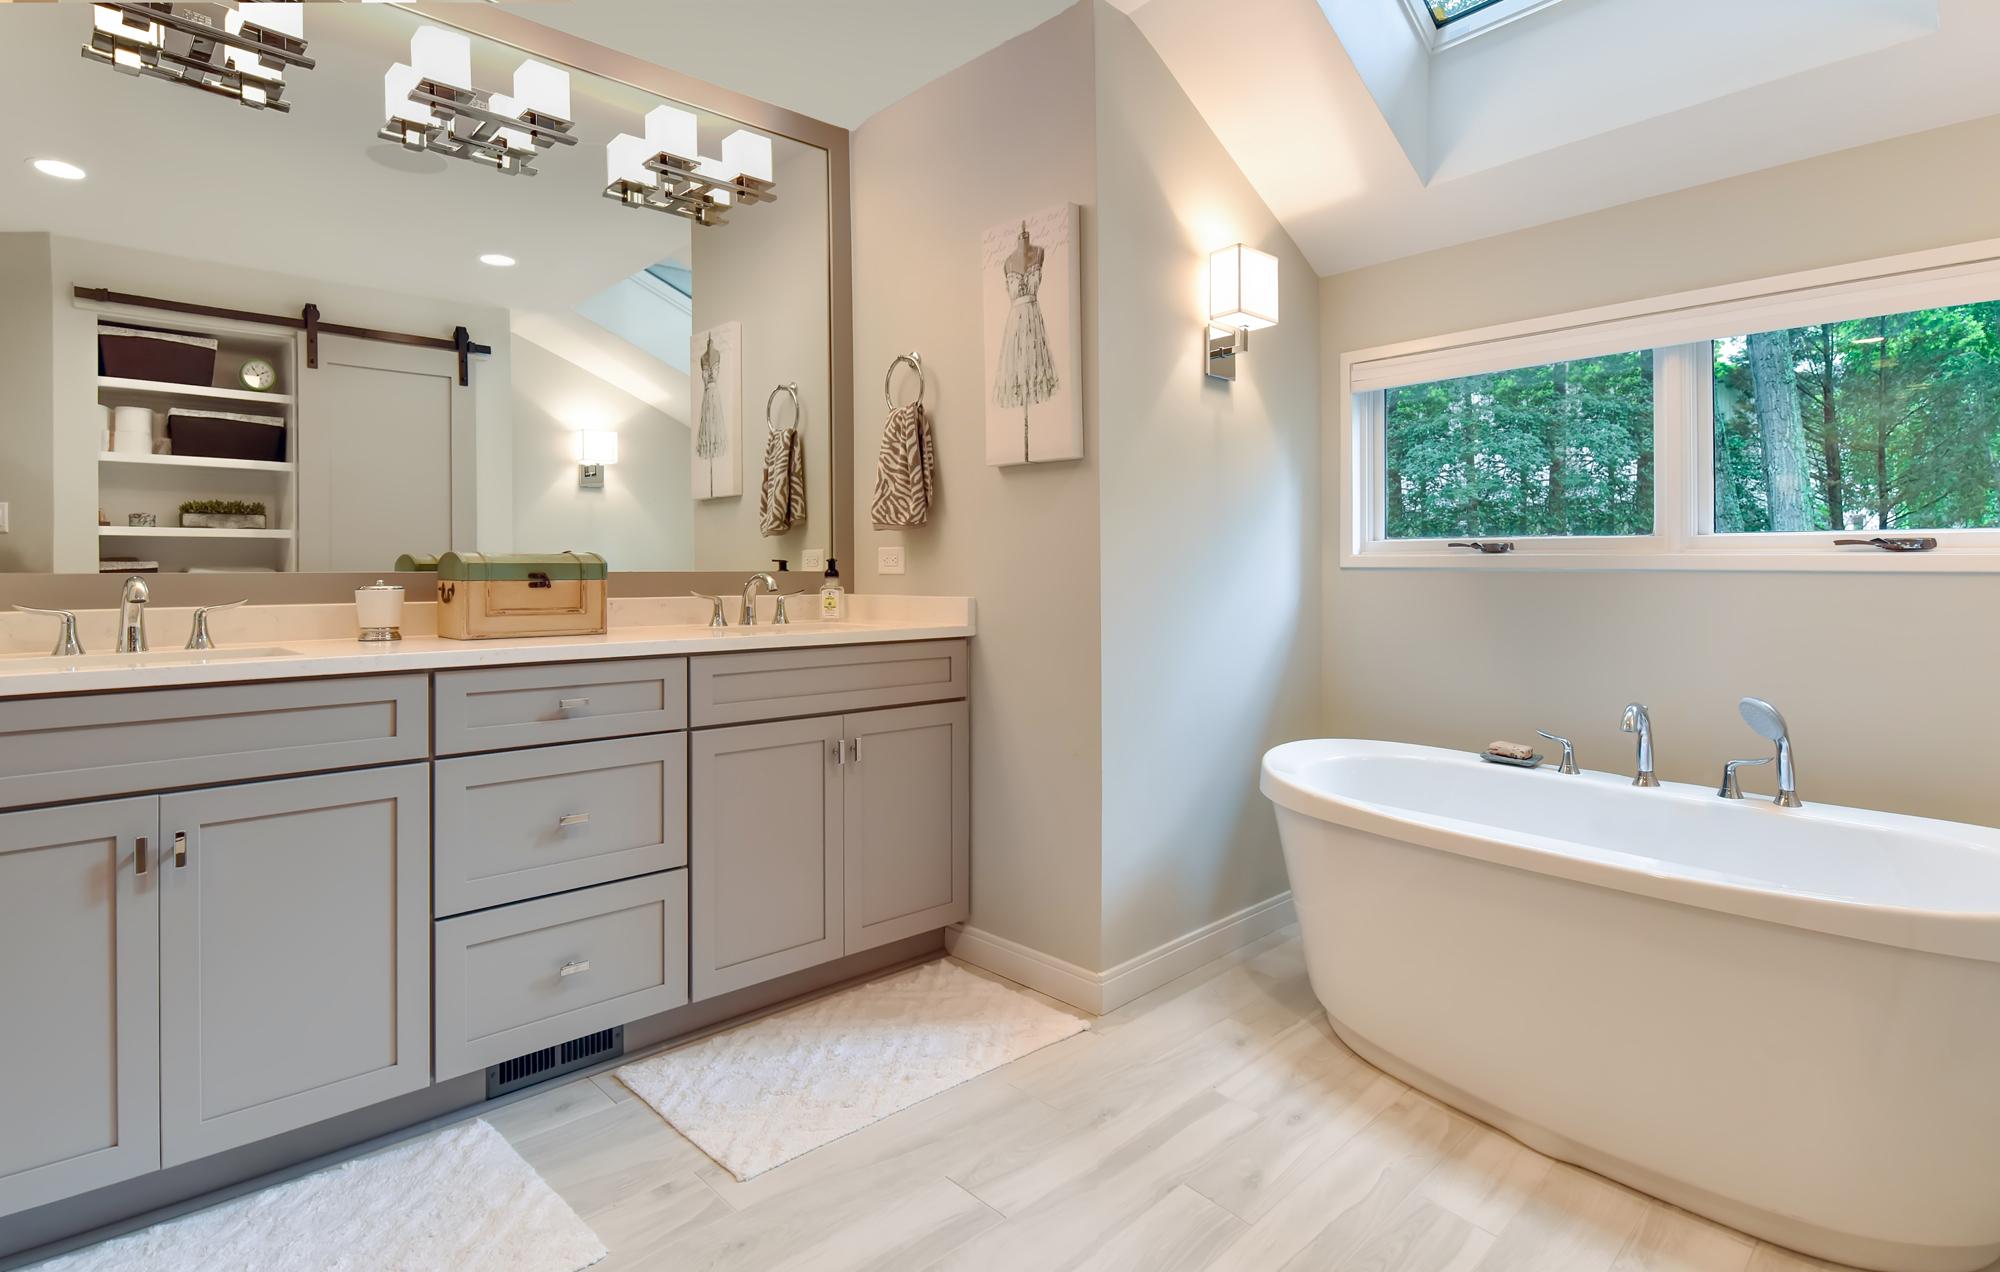 Master Baths & Bathrooms Photos Gallery   BOWA   Design ... on Bathroom Ideas Photo Gallery  id=34639